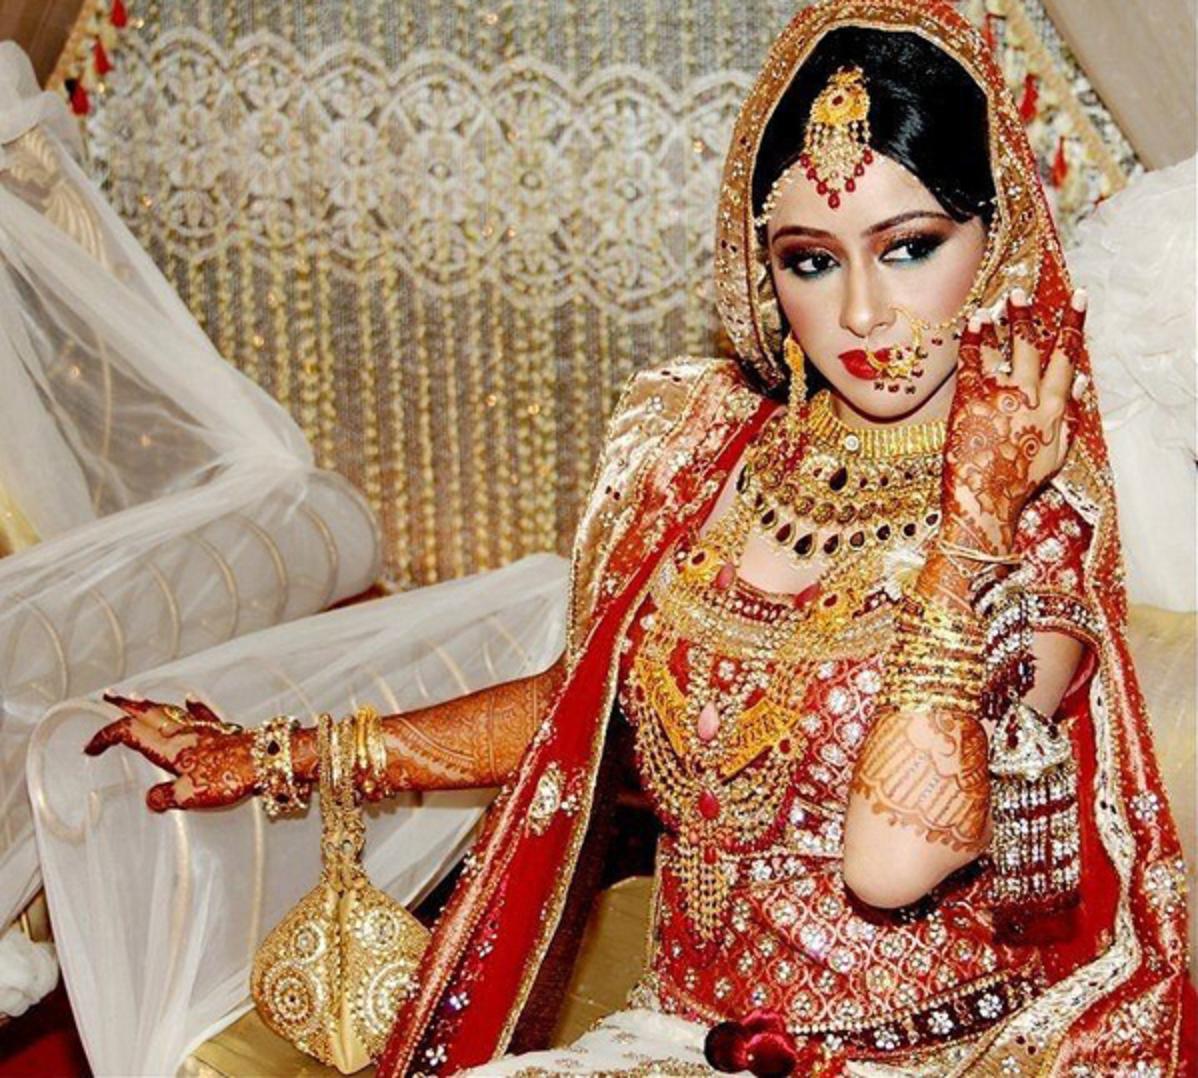 Wedding Indian Fat Bride - HD Wallpaper